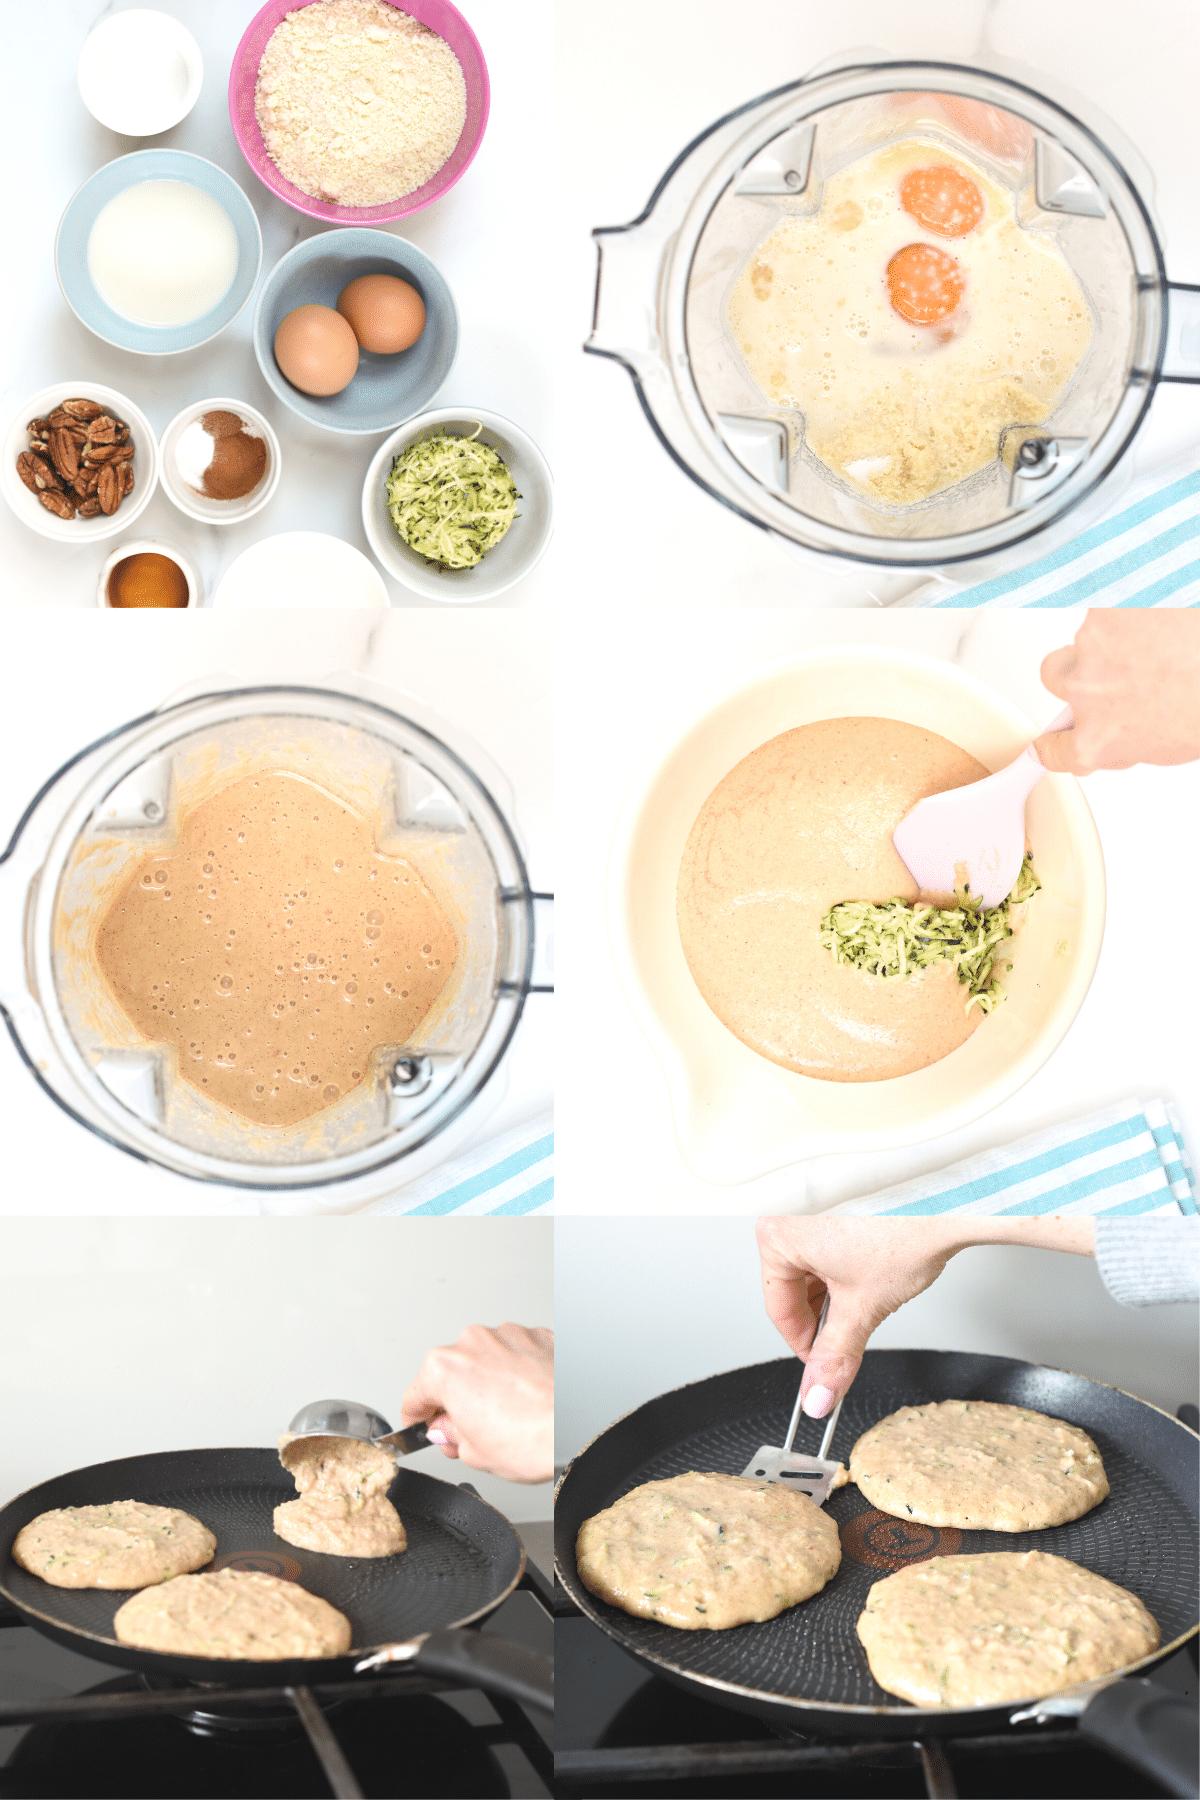 How to make Keto Zucchini Pancakes